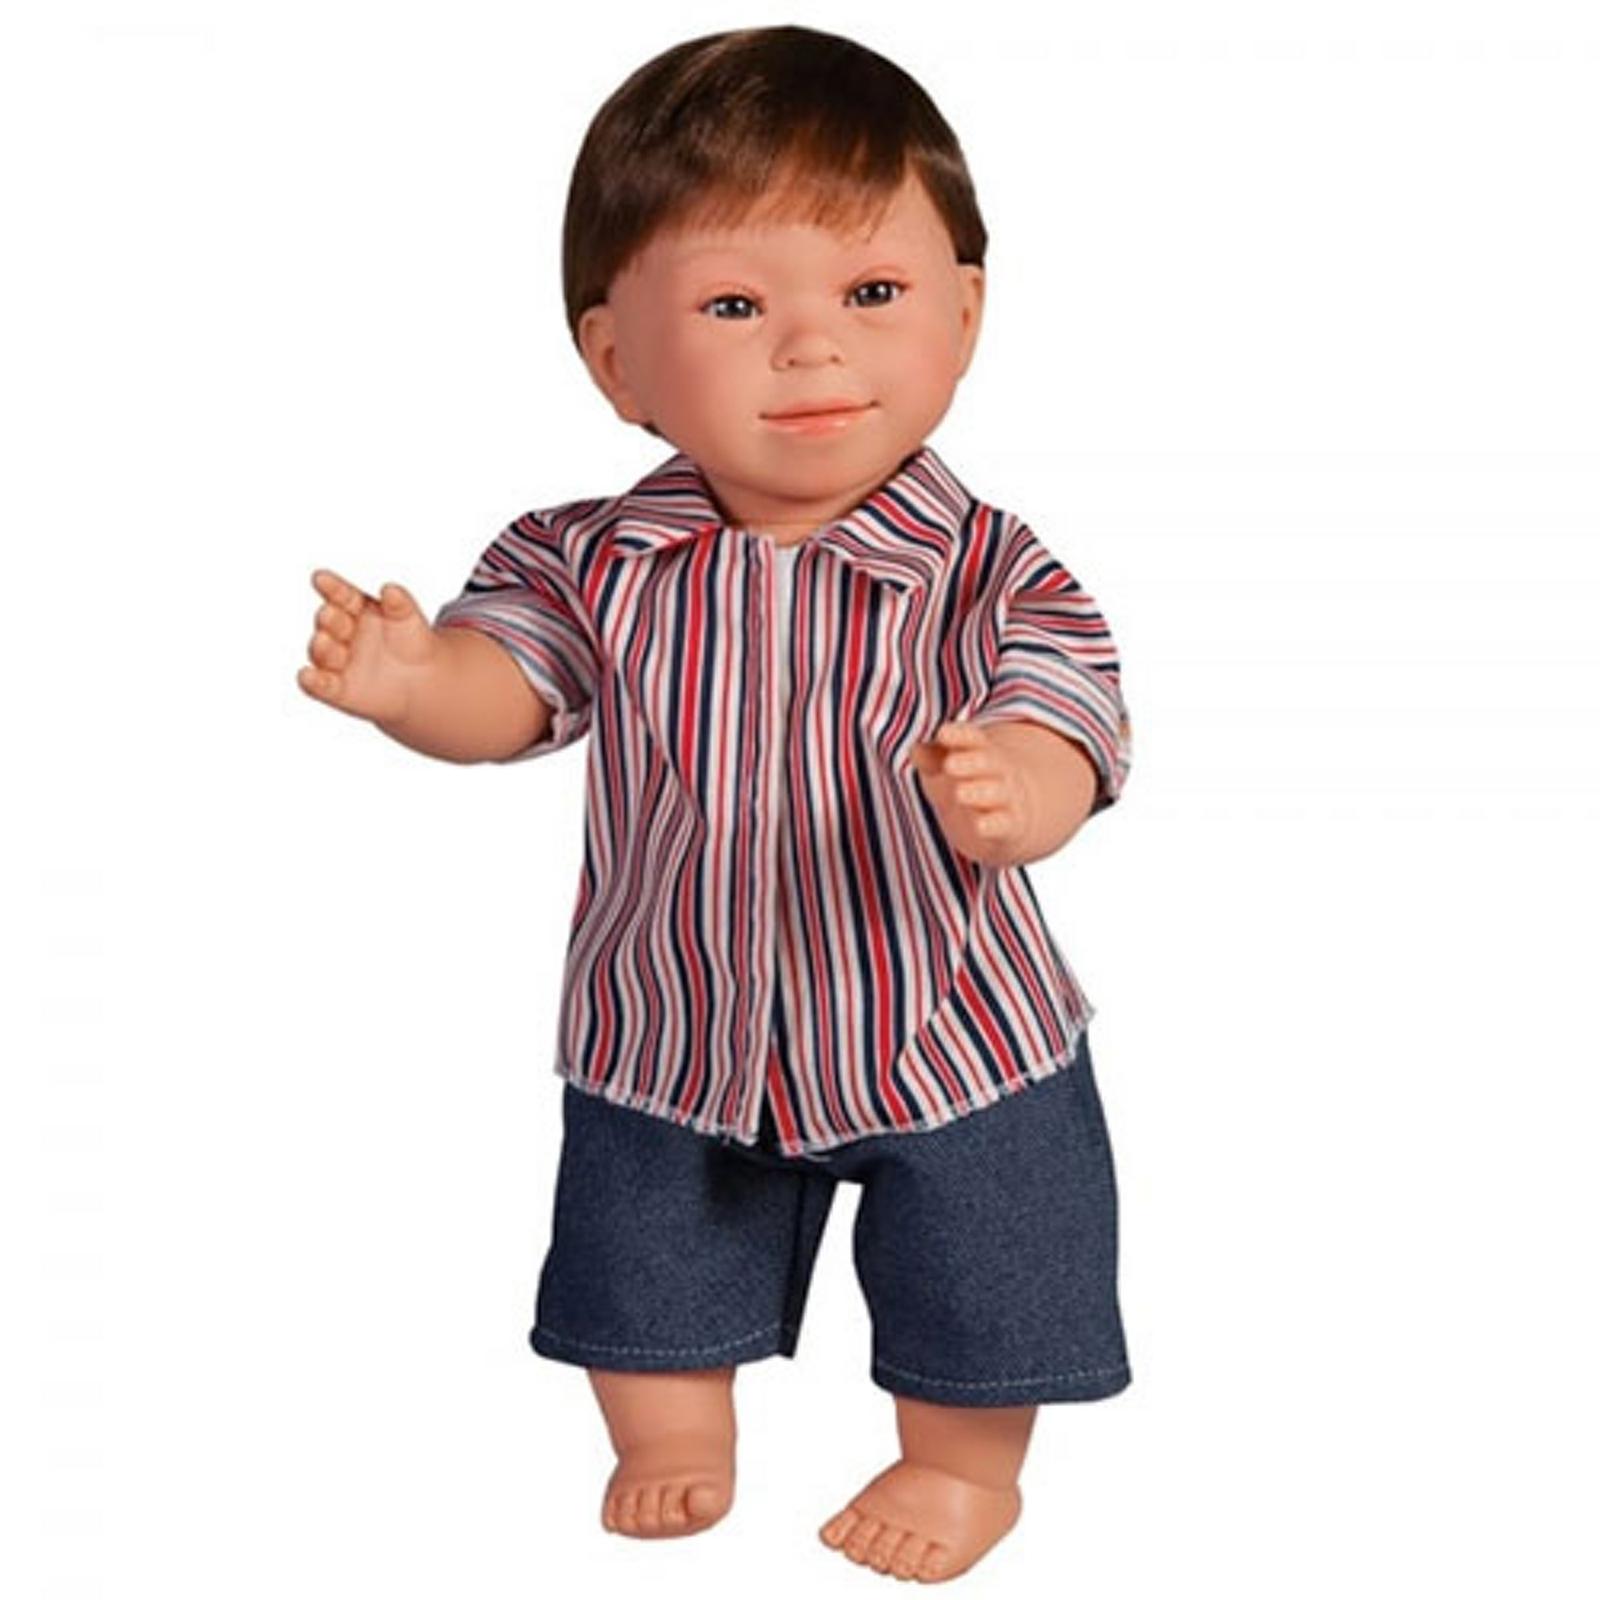 Boy Doll With Downs Syndrome Dark Hair